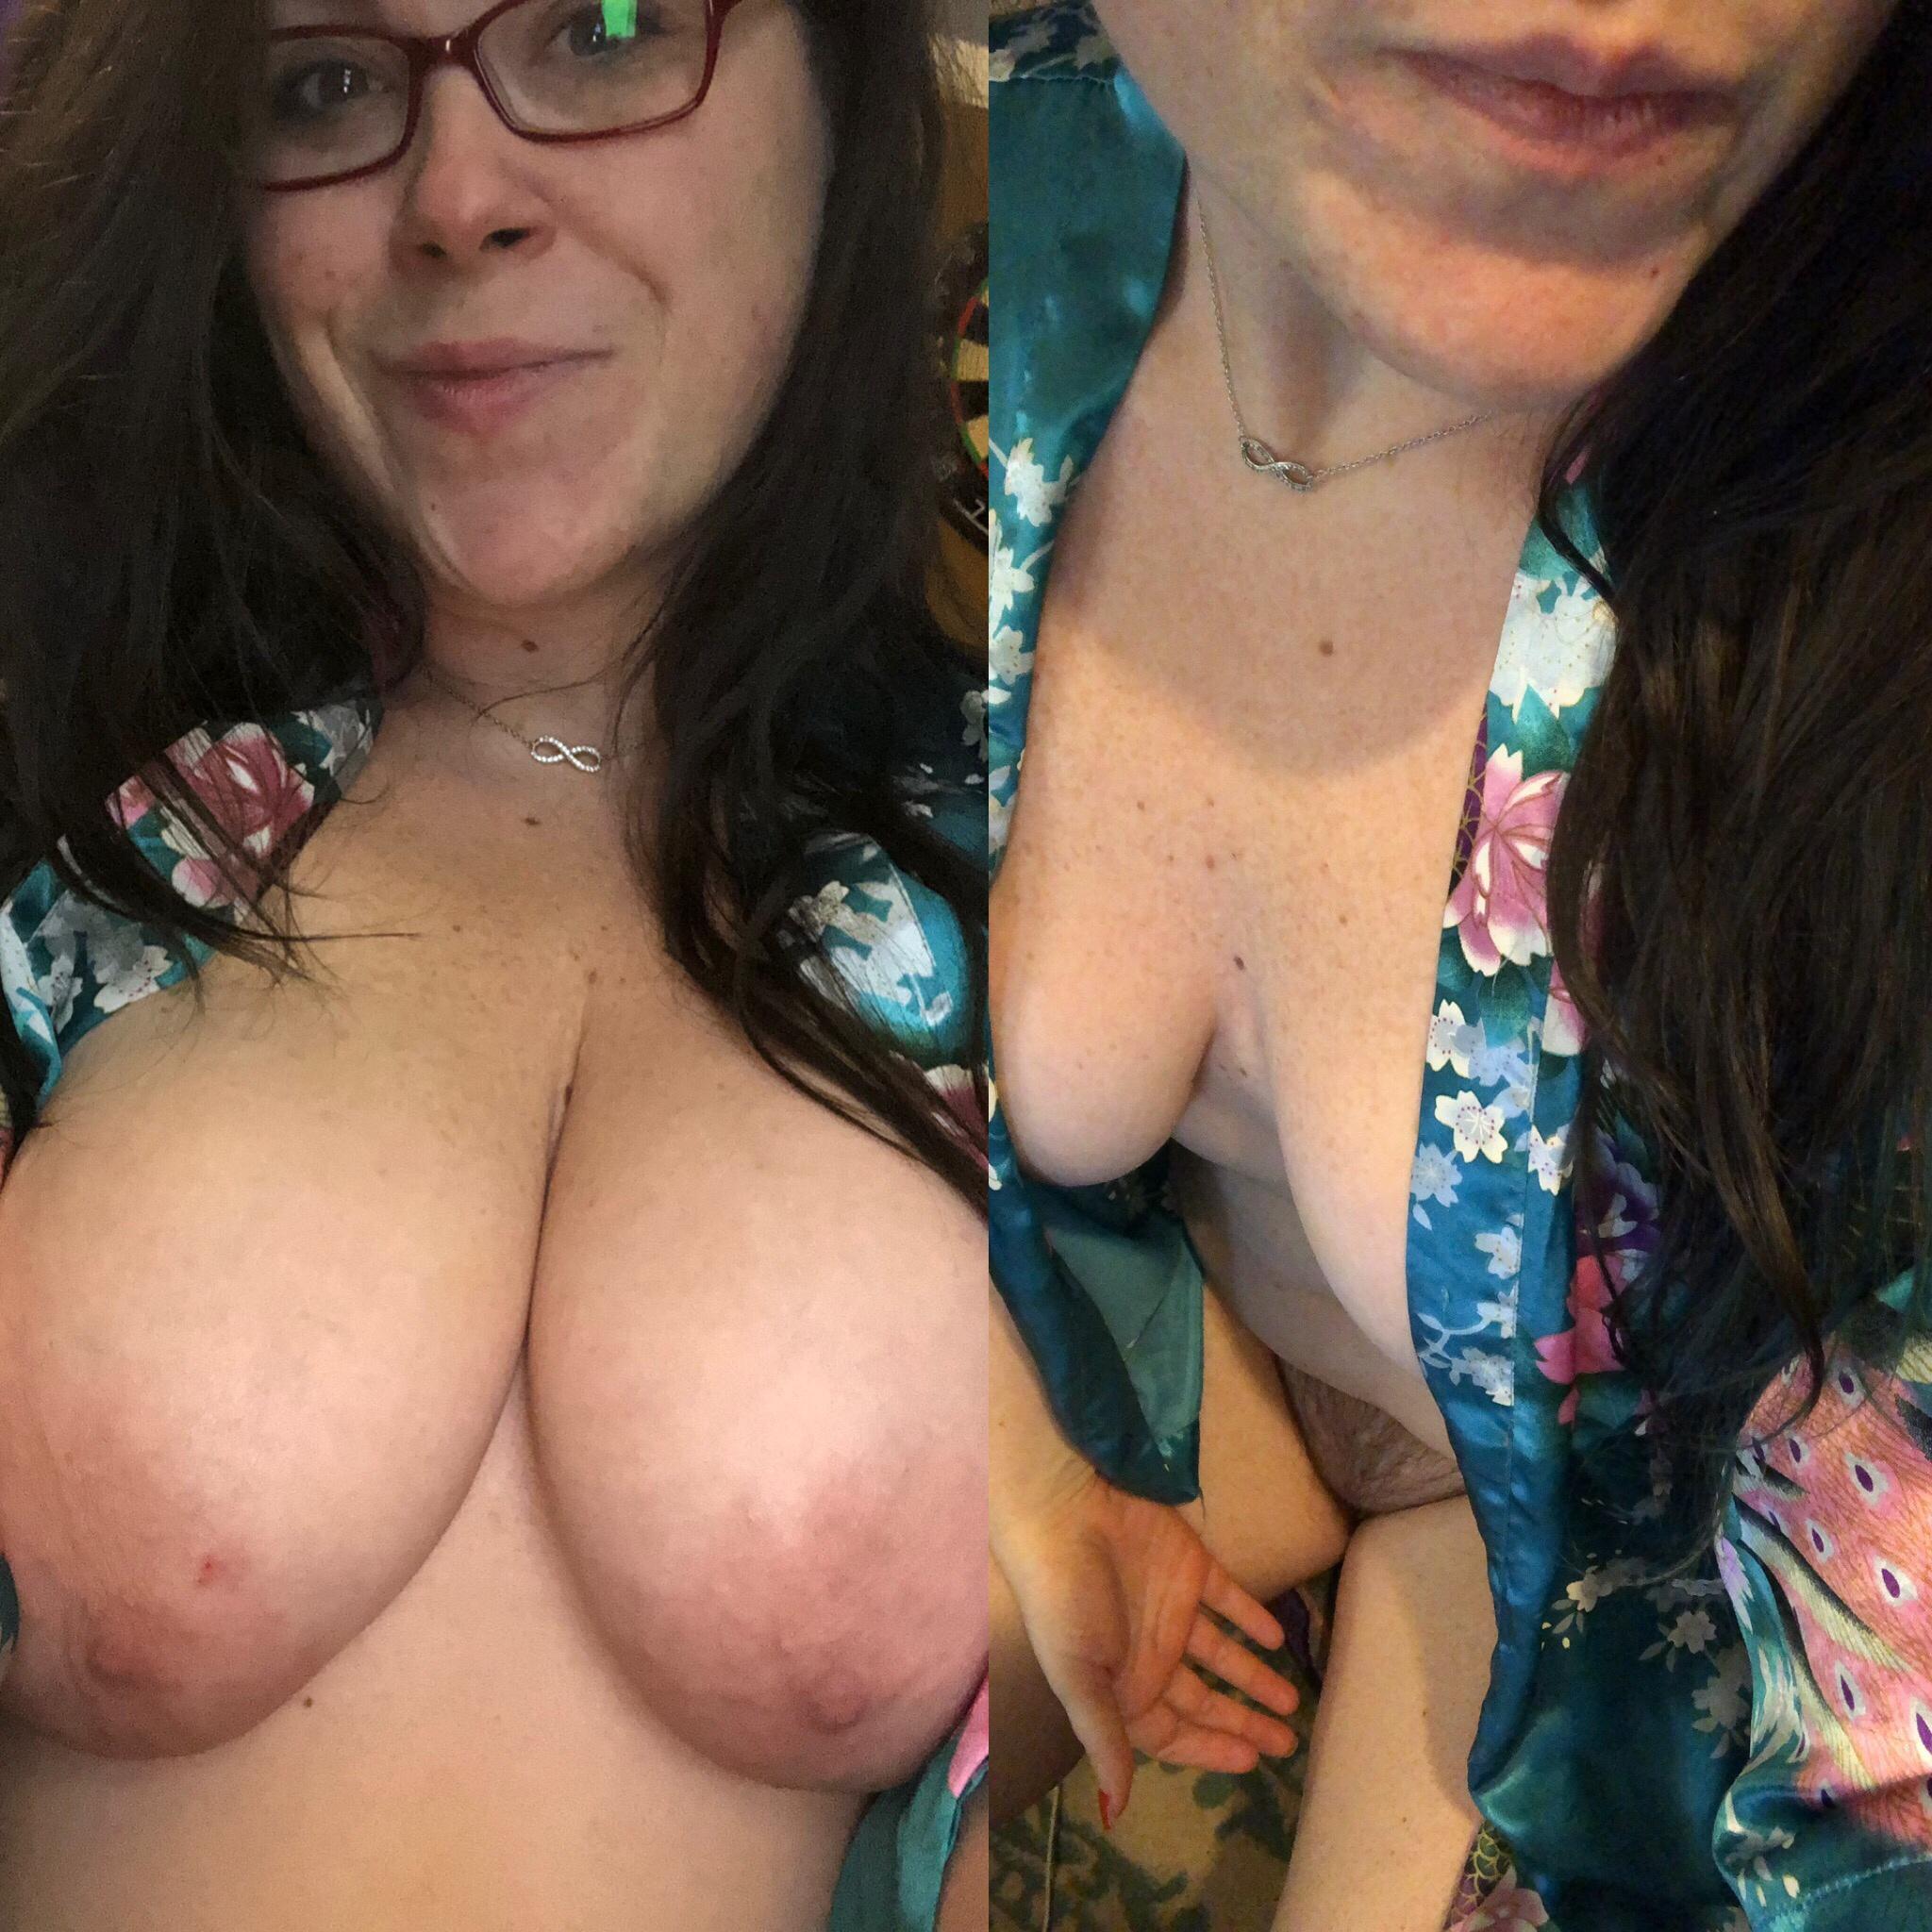 Women in thong naked